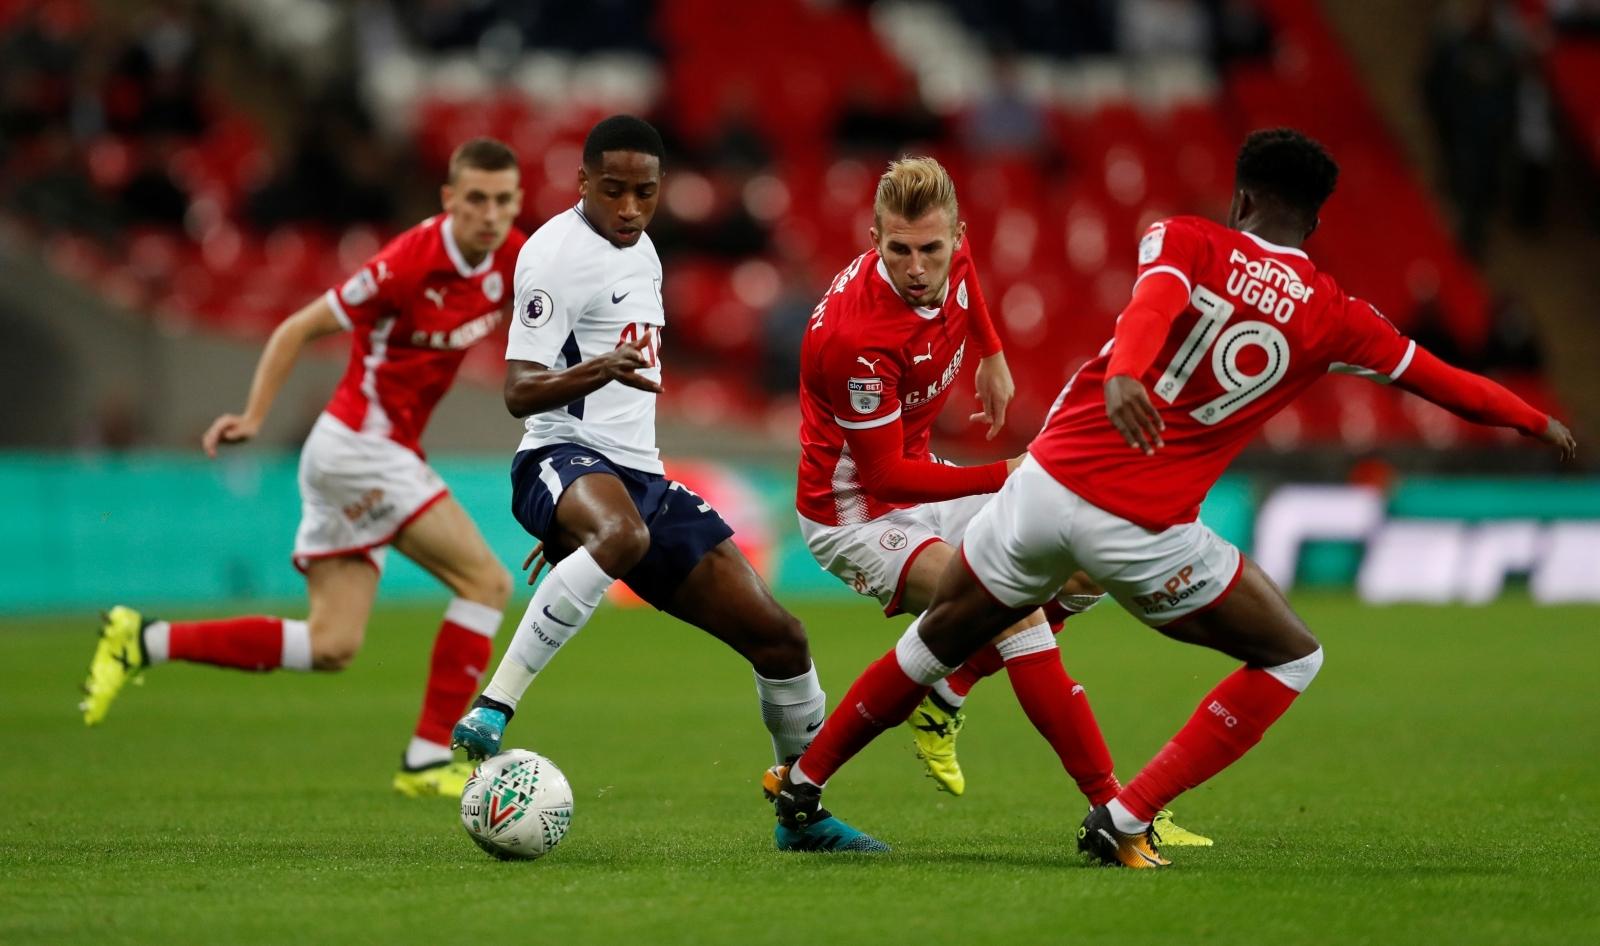 Tottenham 0-0 Barnsley: Carabao Cup third round - LIVE